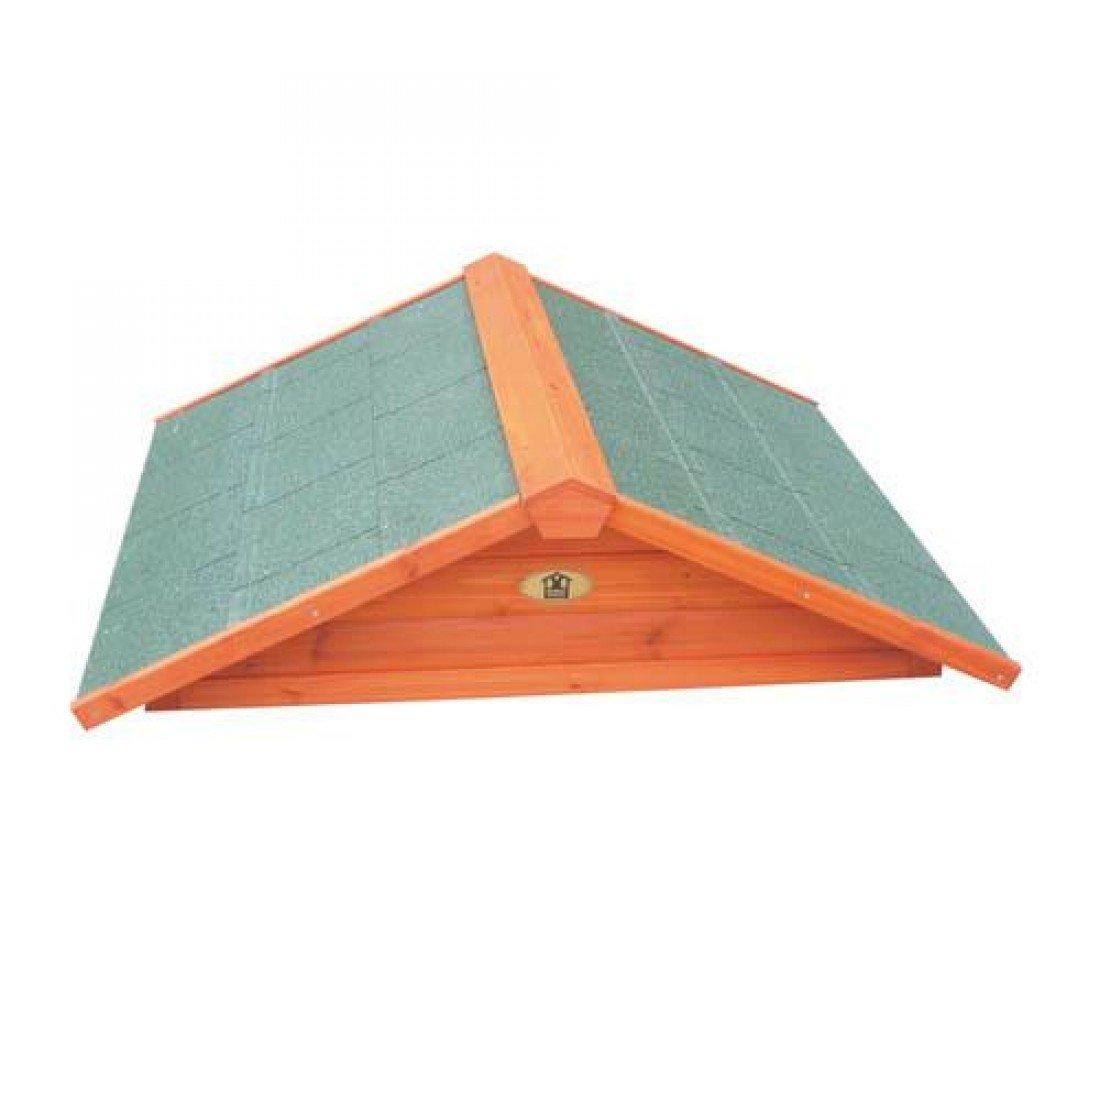 Lbpp Domestic Clearance Premium Flat Pack Rabbit   Guinea Pig Hutch Roof Single